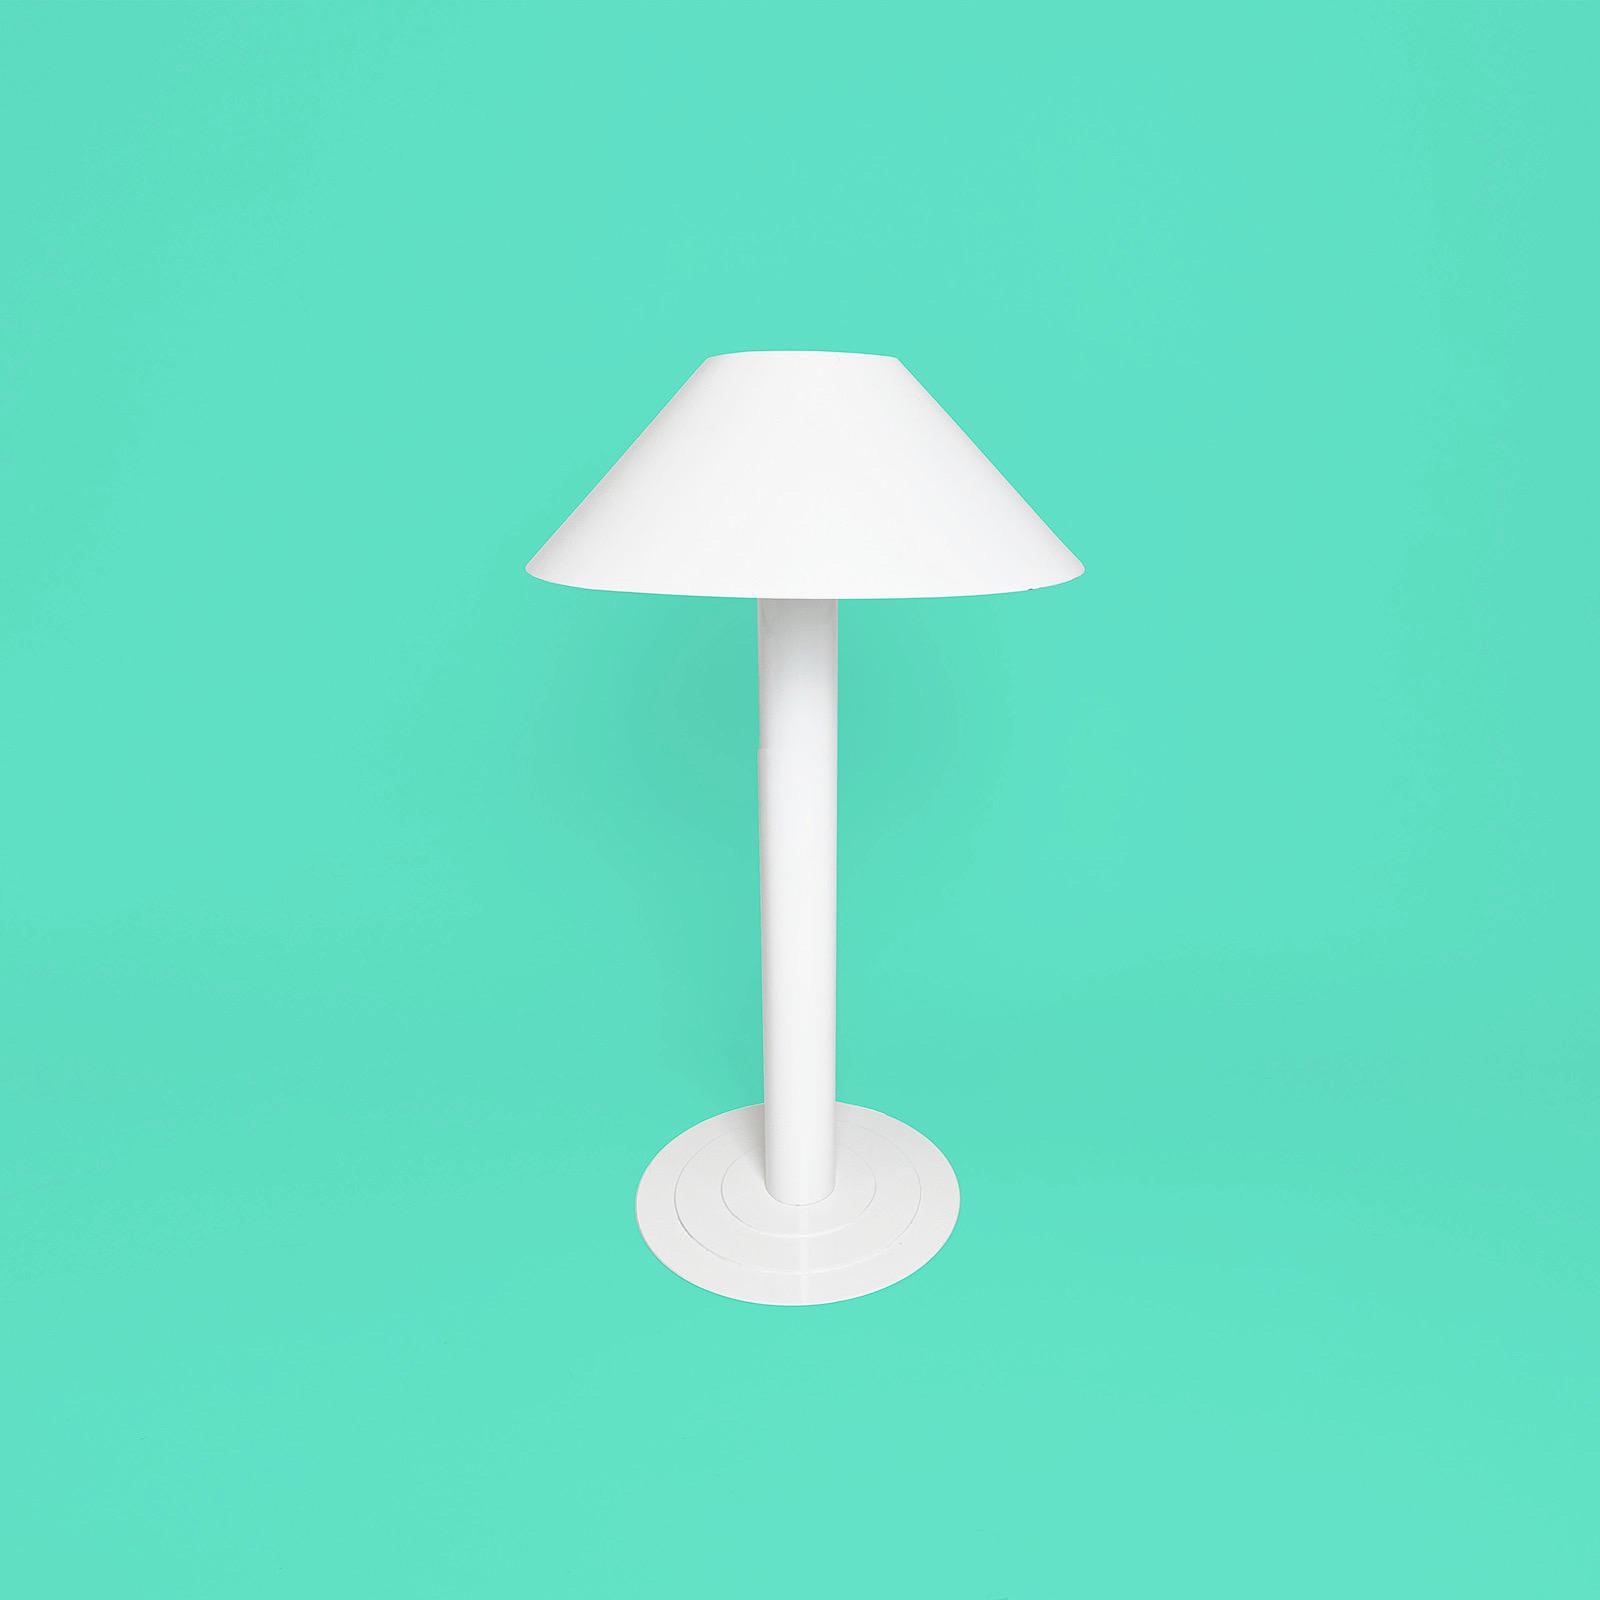 lampe arlus blanche années 70 80